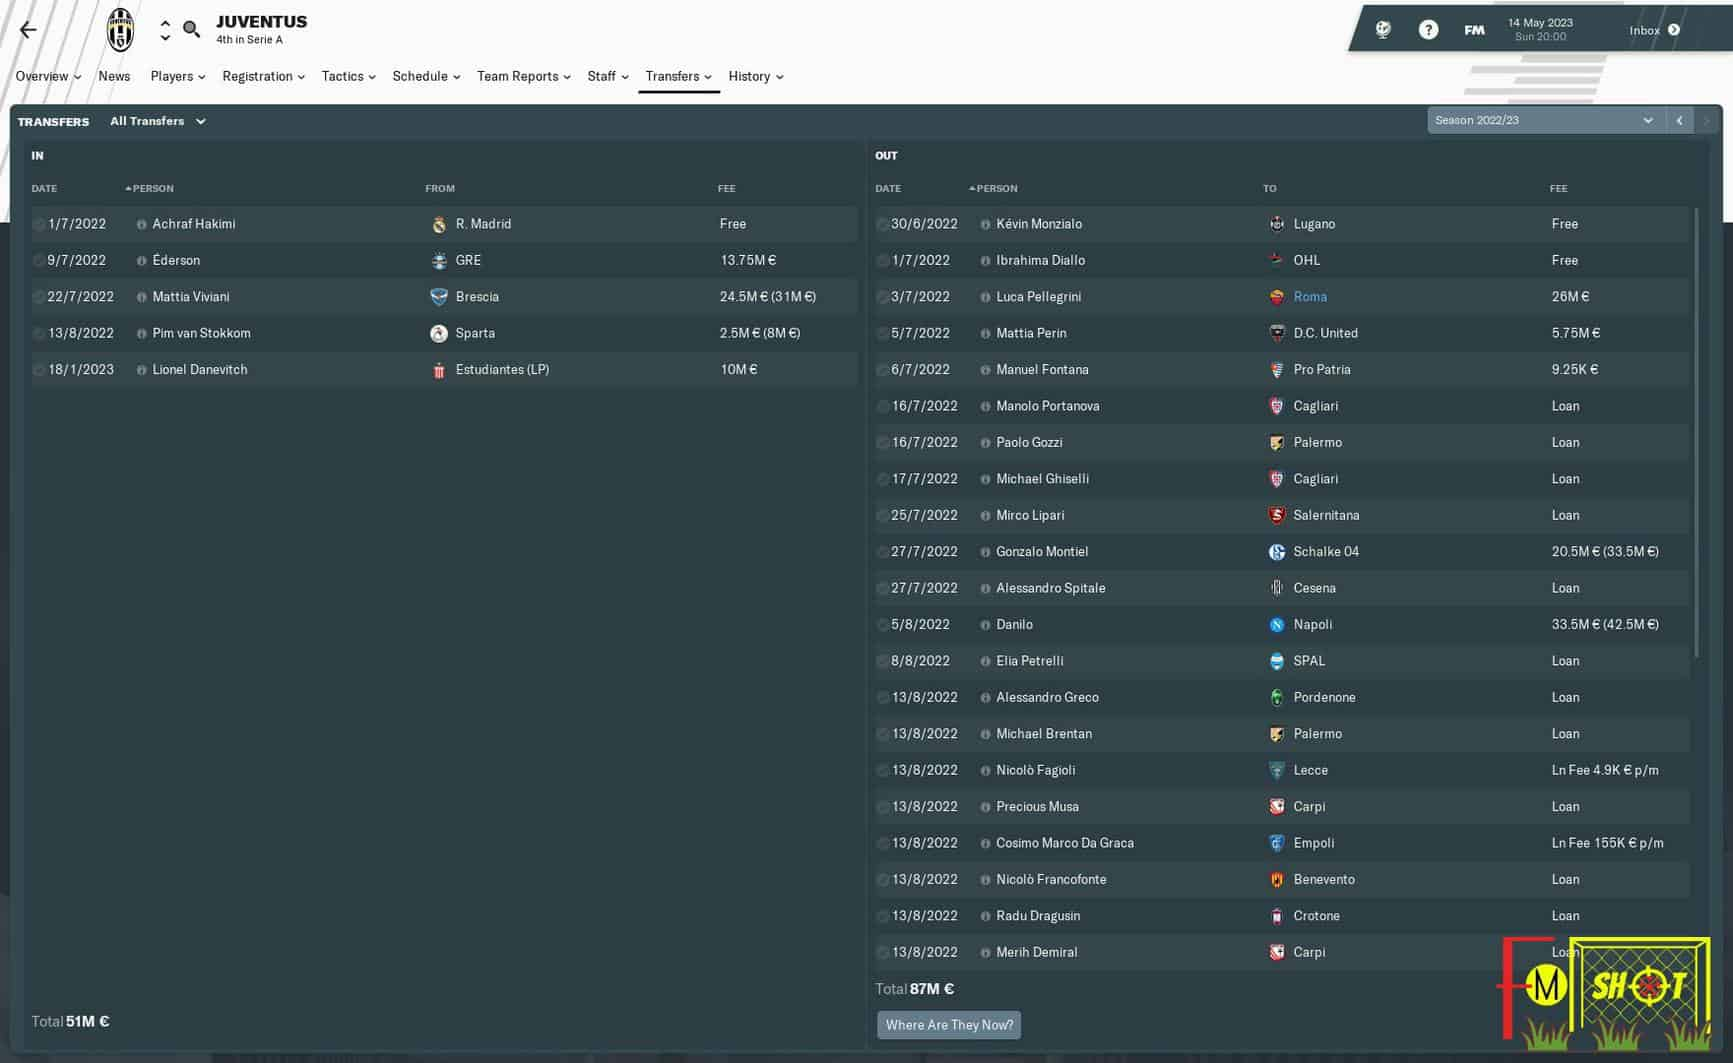 Juventus Transfer History